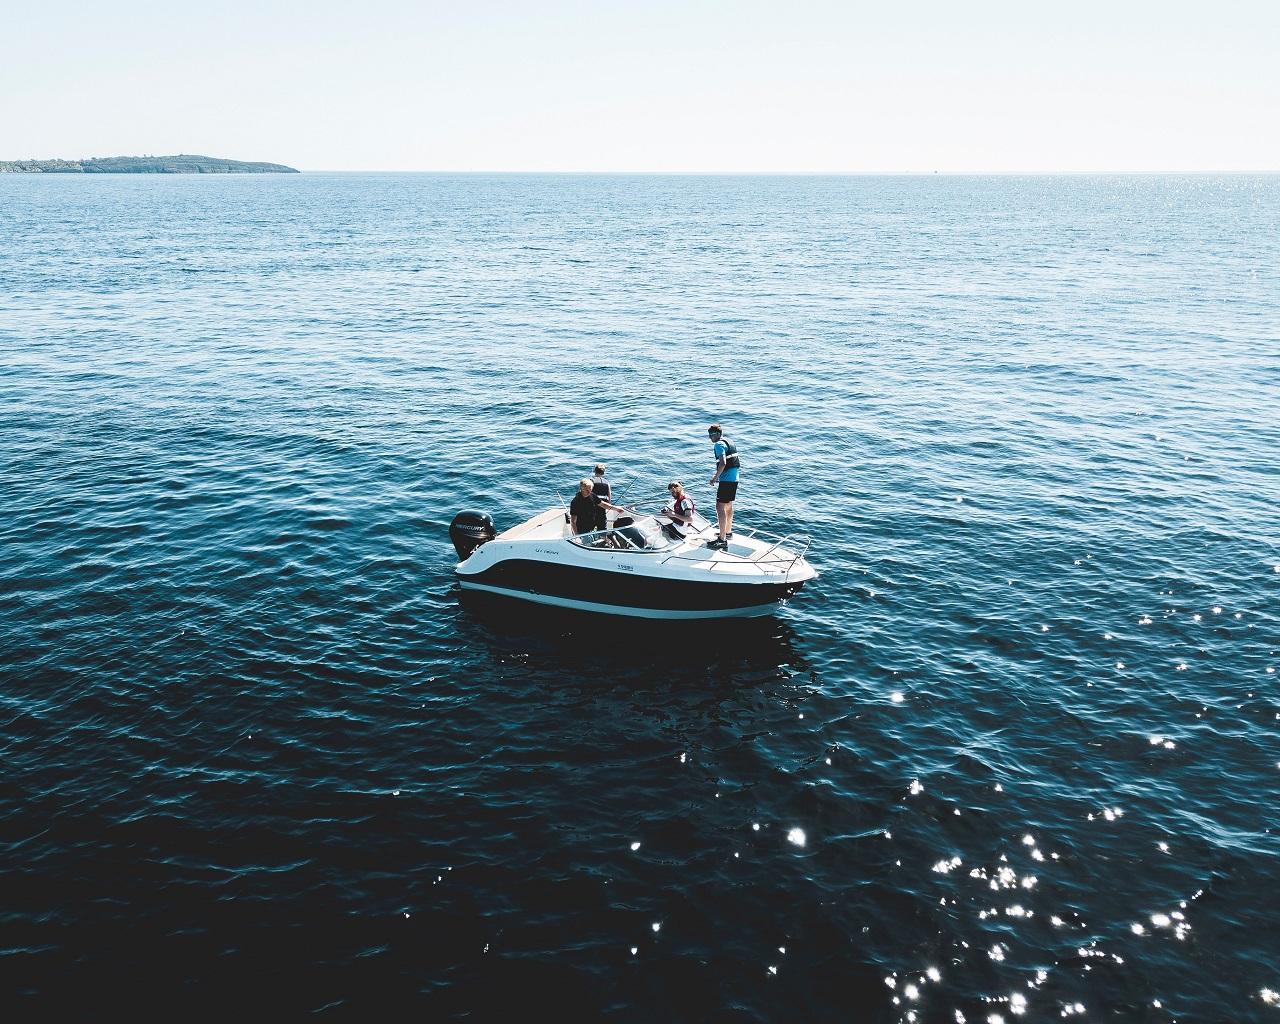 fiske - småbåt - sommerferie - Norgesferie - båtvett - Fremtind